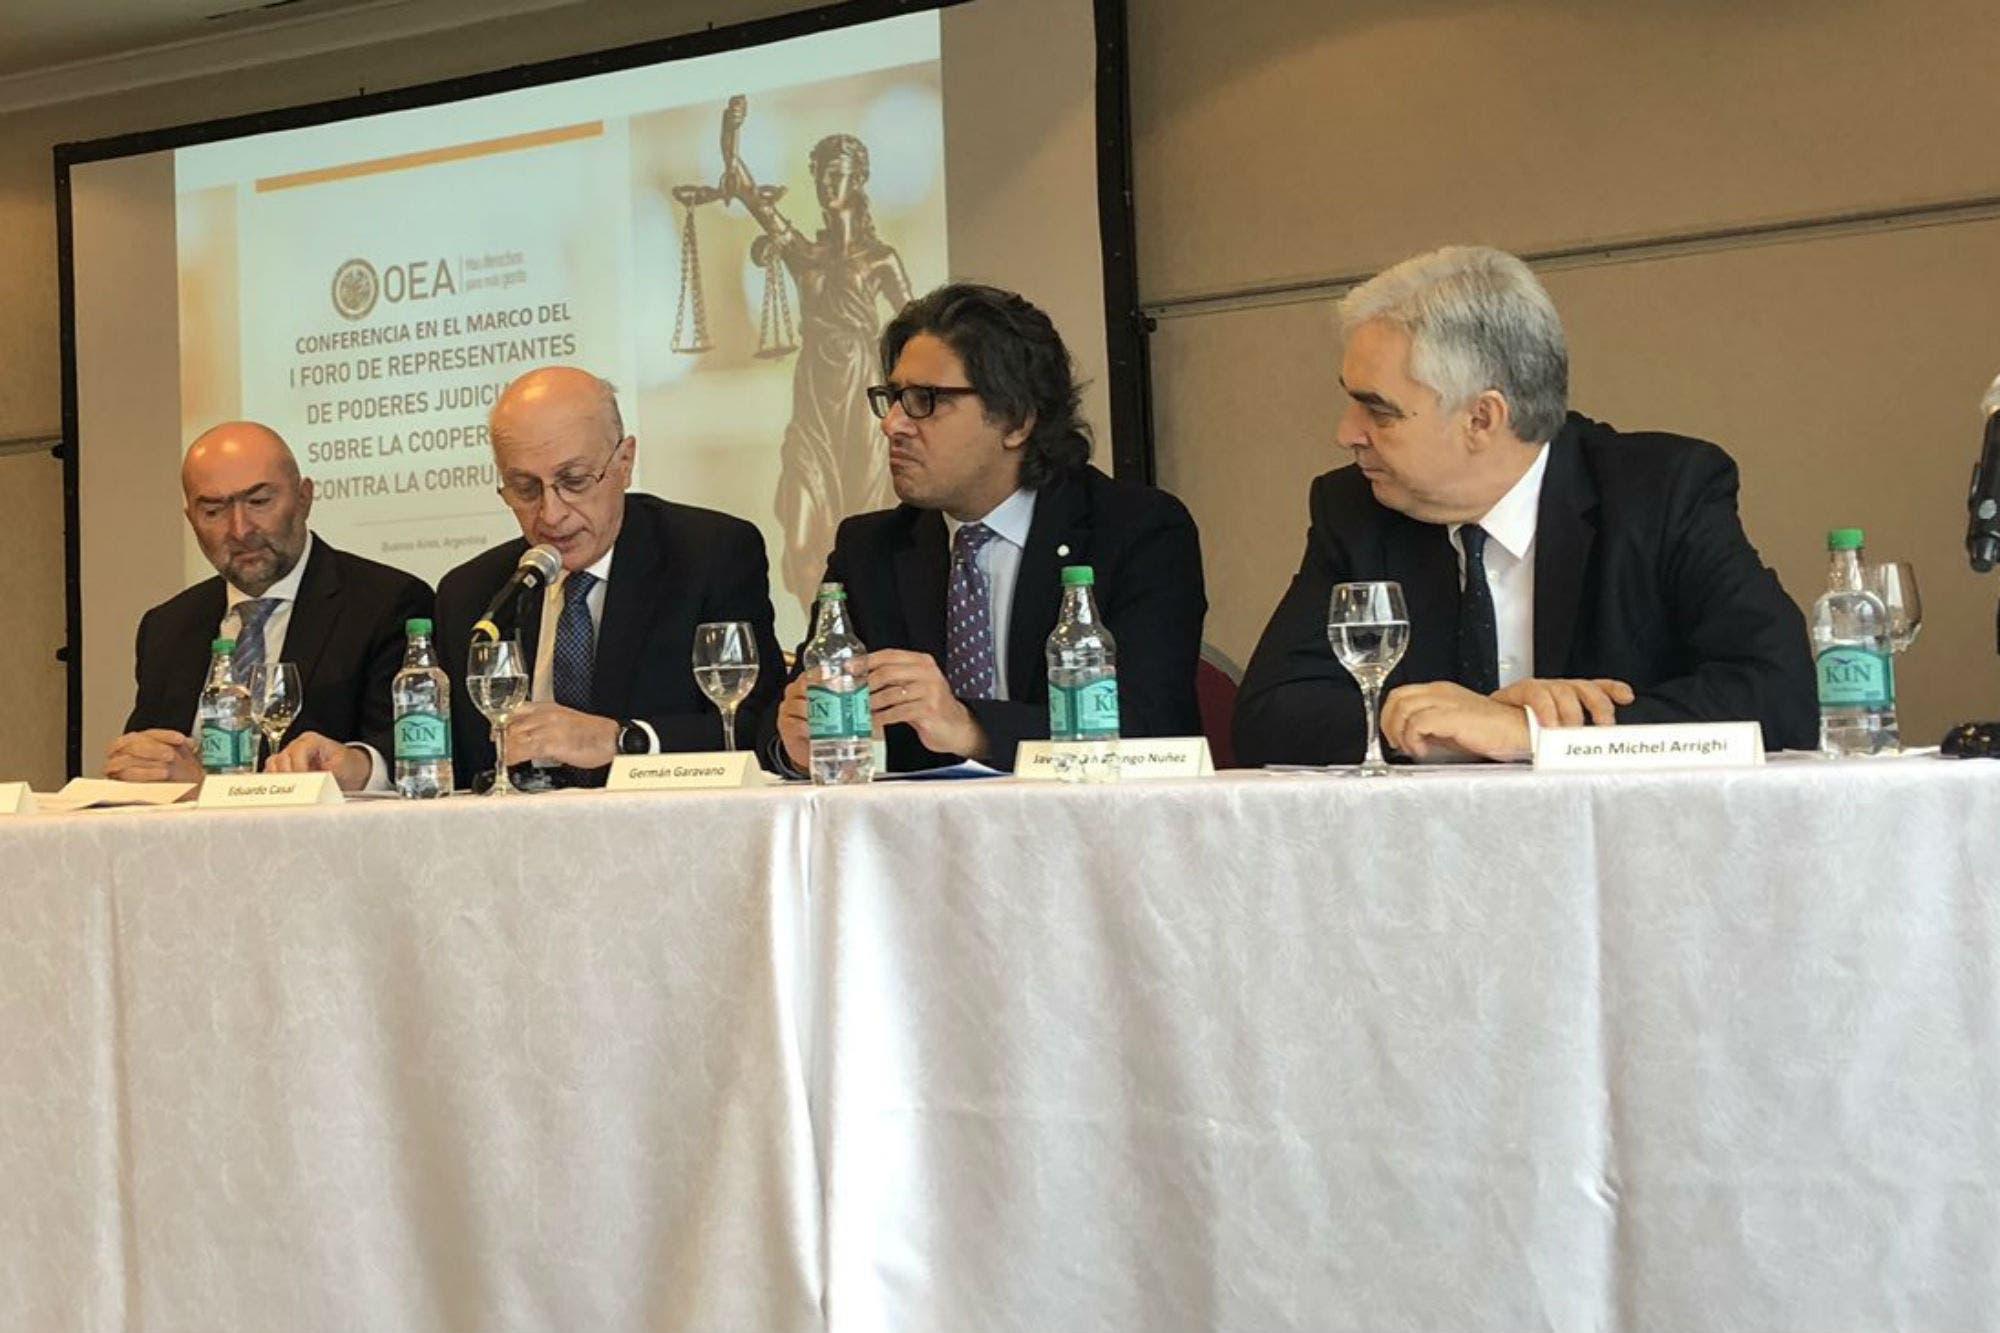 Con Lorenzetti ausente, comenzó un foro de la OEA contra la corrupción